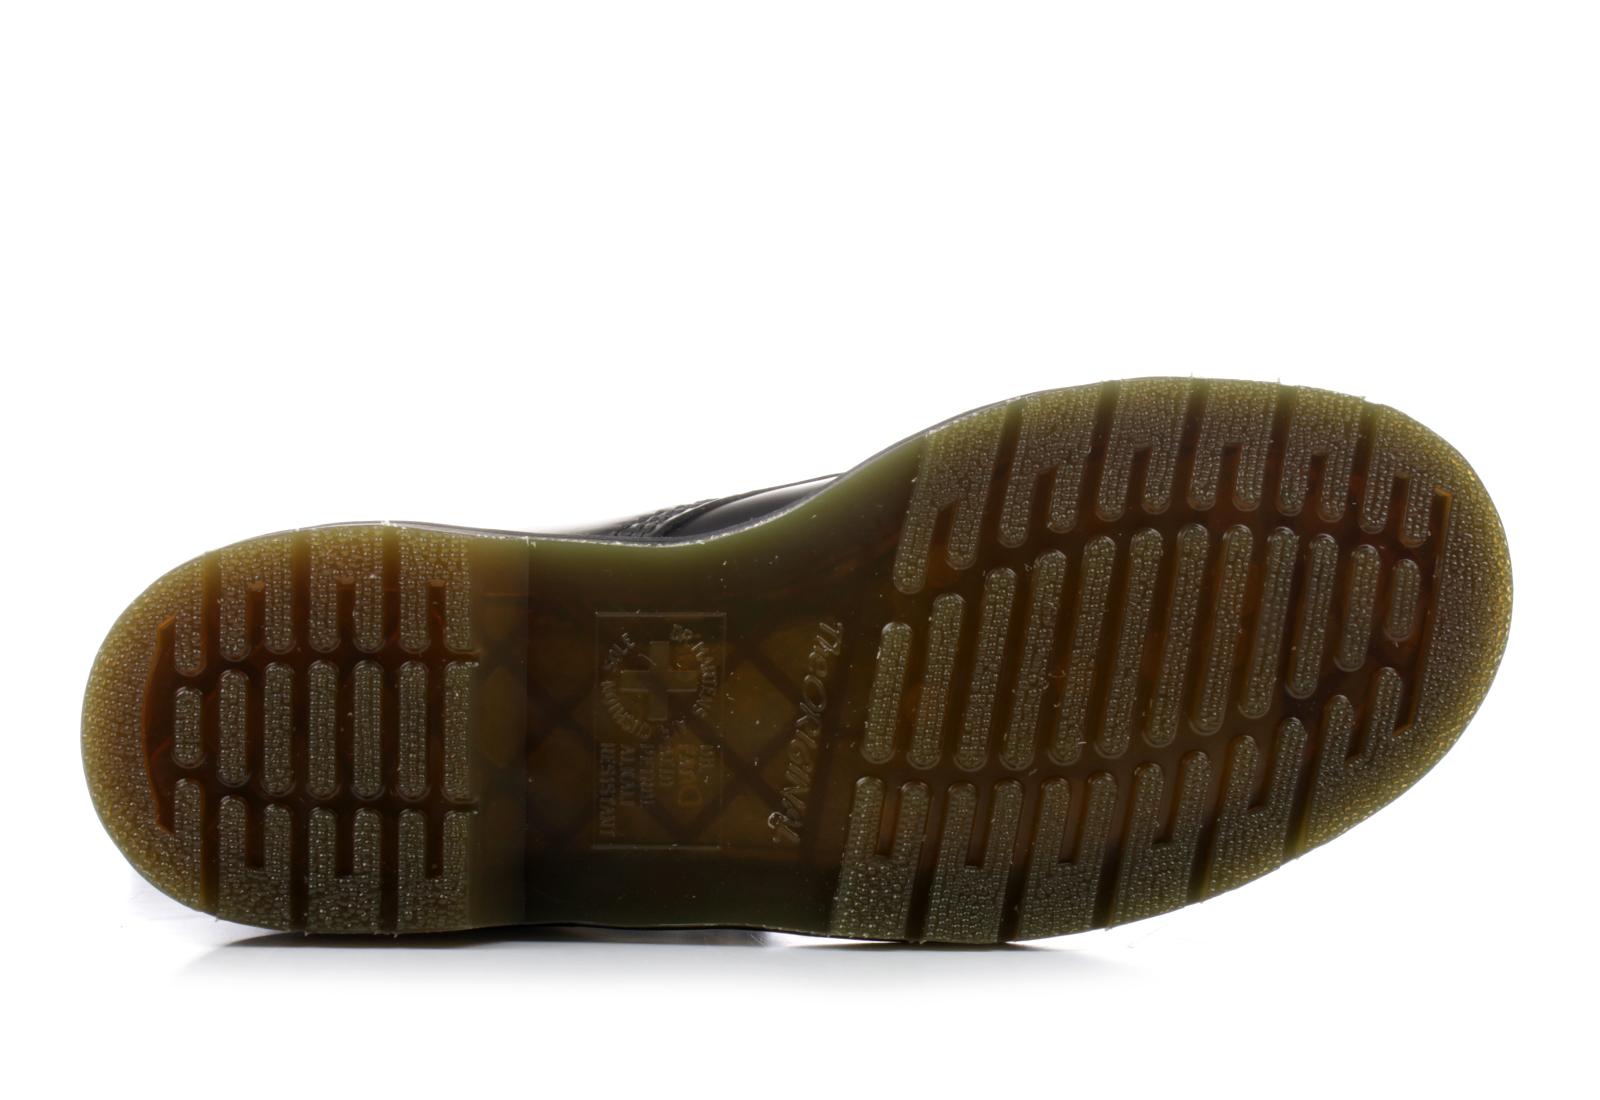 c0d52ccf6665 Dr Martens Boots - 1490 - 10 Eye Boot - DM10092001 - Online shop for ...